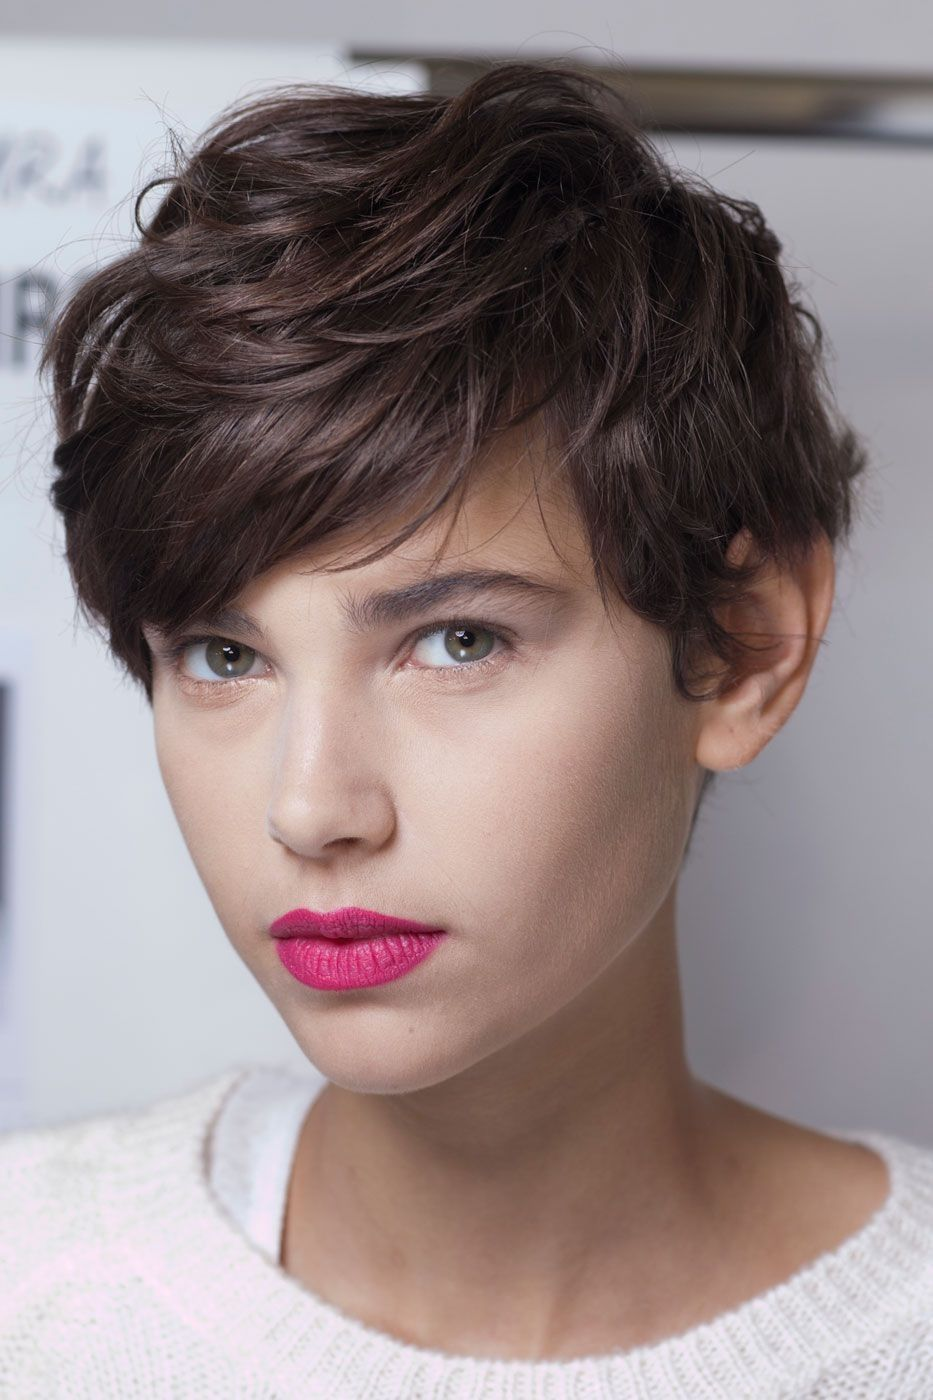 pin by merri krempa on haircuts i like | short wavy hair